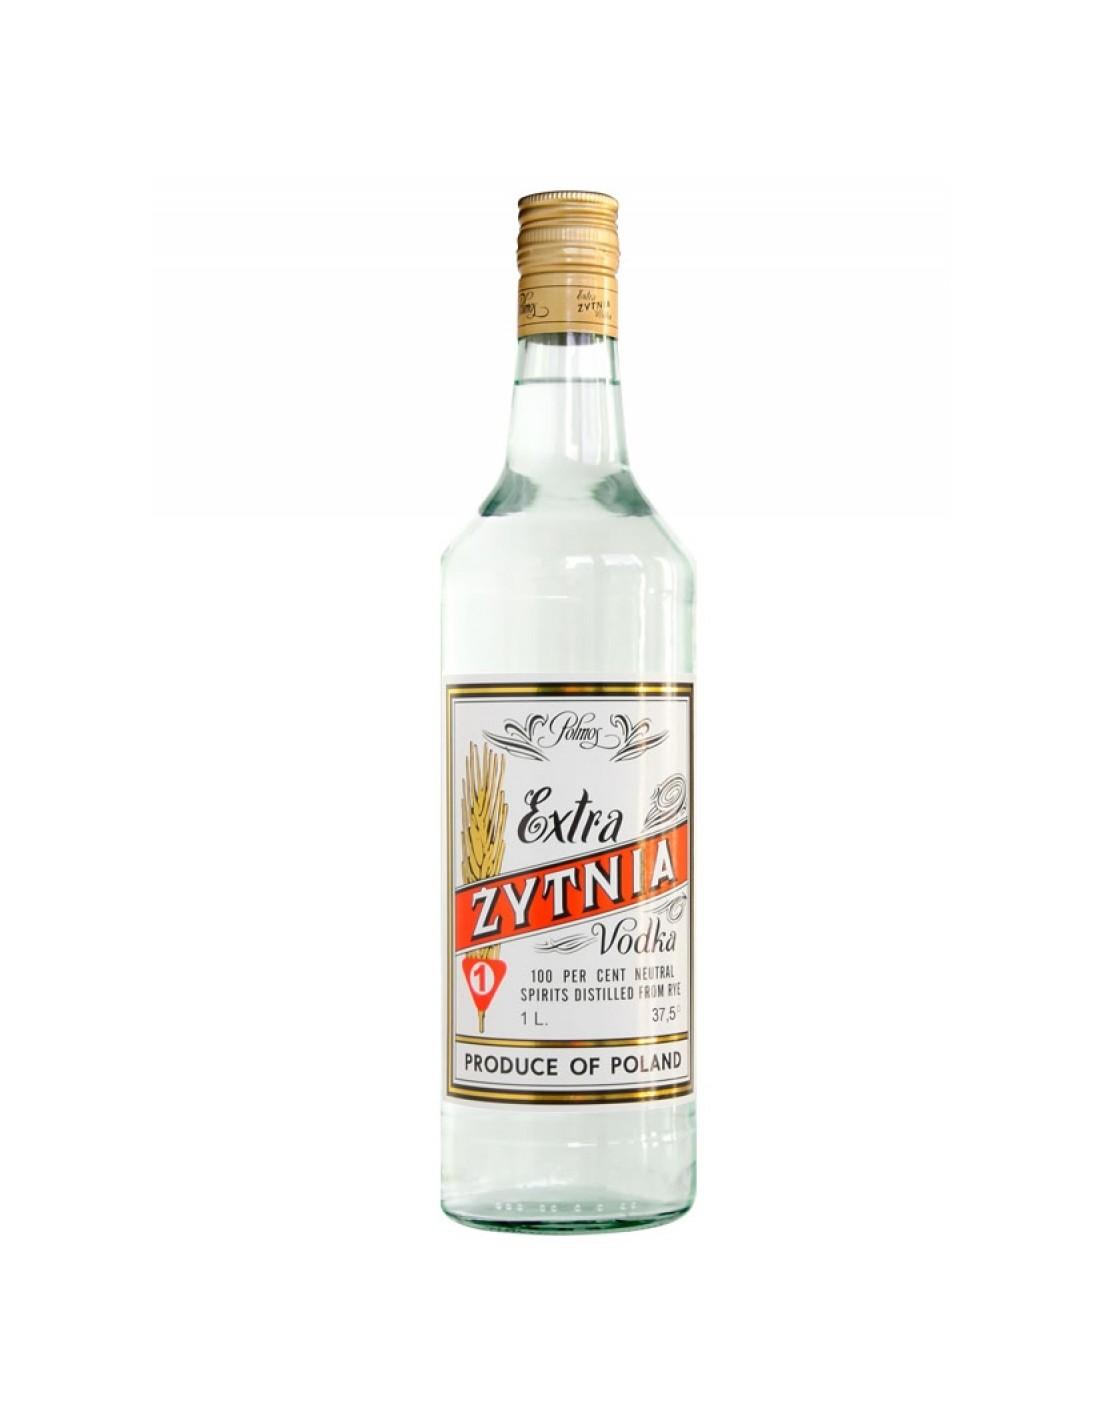 Vodca Extra Zytnia 1L, 37.5% alc., Polonia